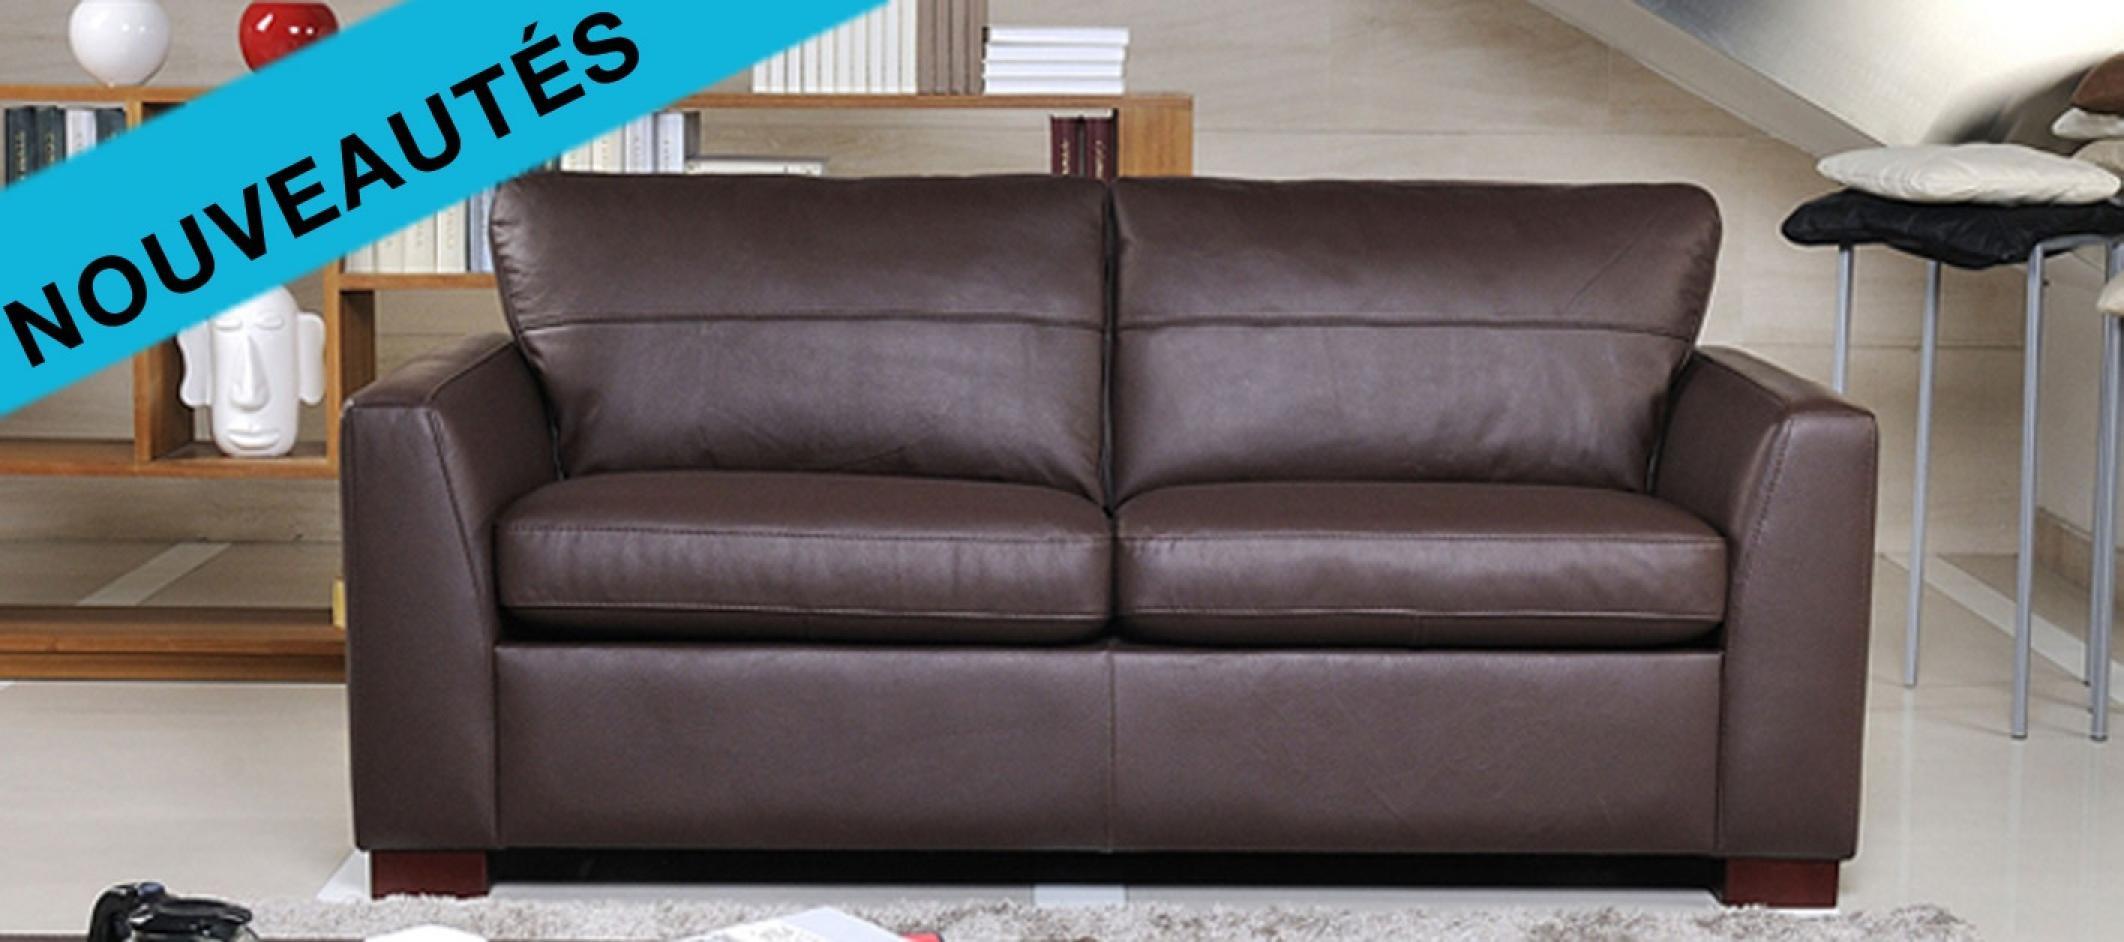 photos canap convertible 2 places cuir. Black Bedroom Furniture Sets. Home Design Ideas